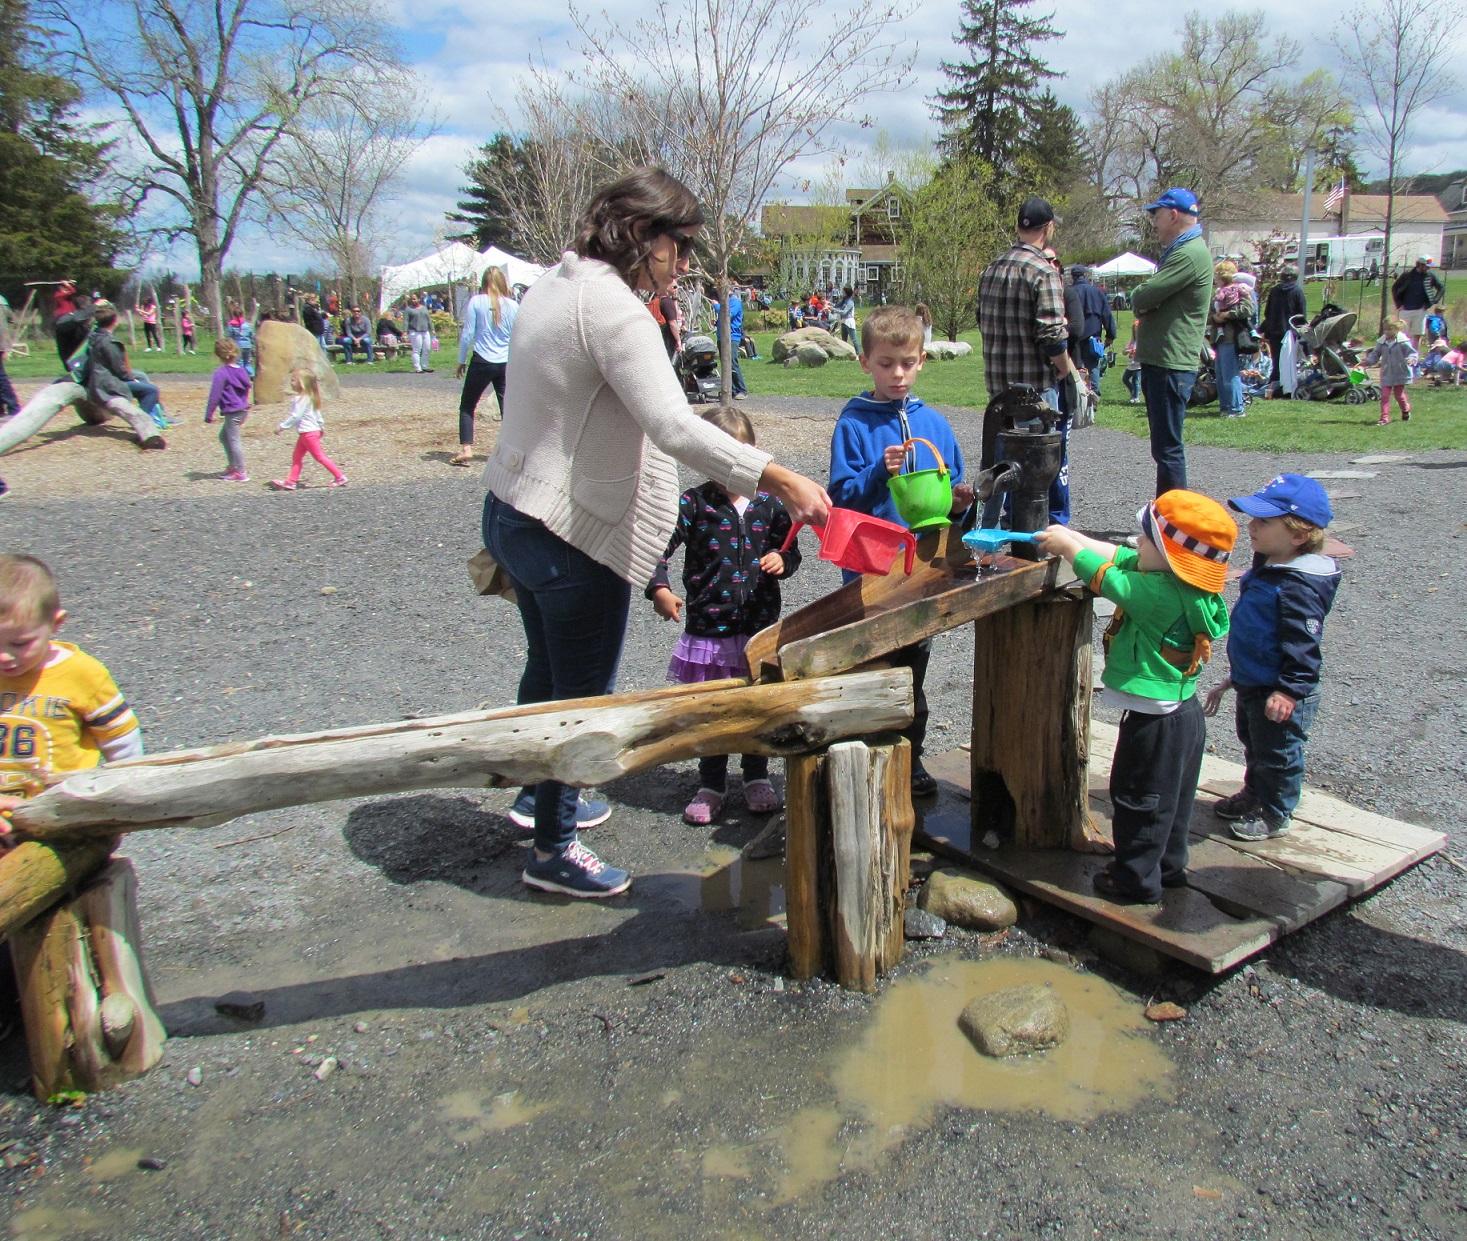 Community Play Day grasshopper grove.jpg